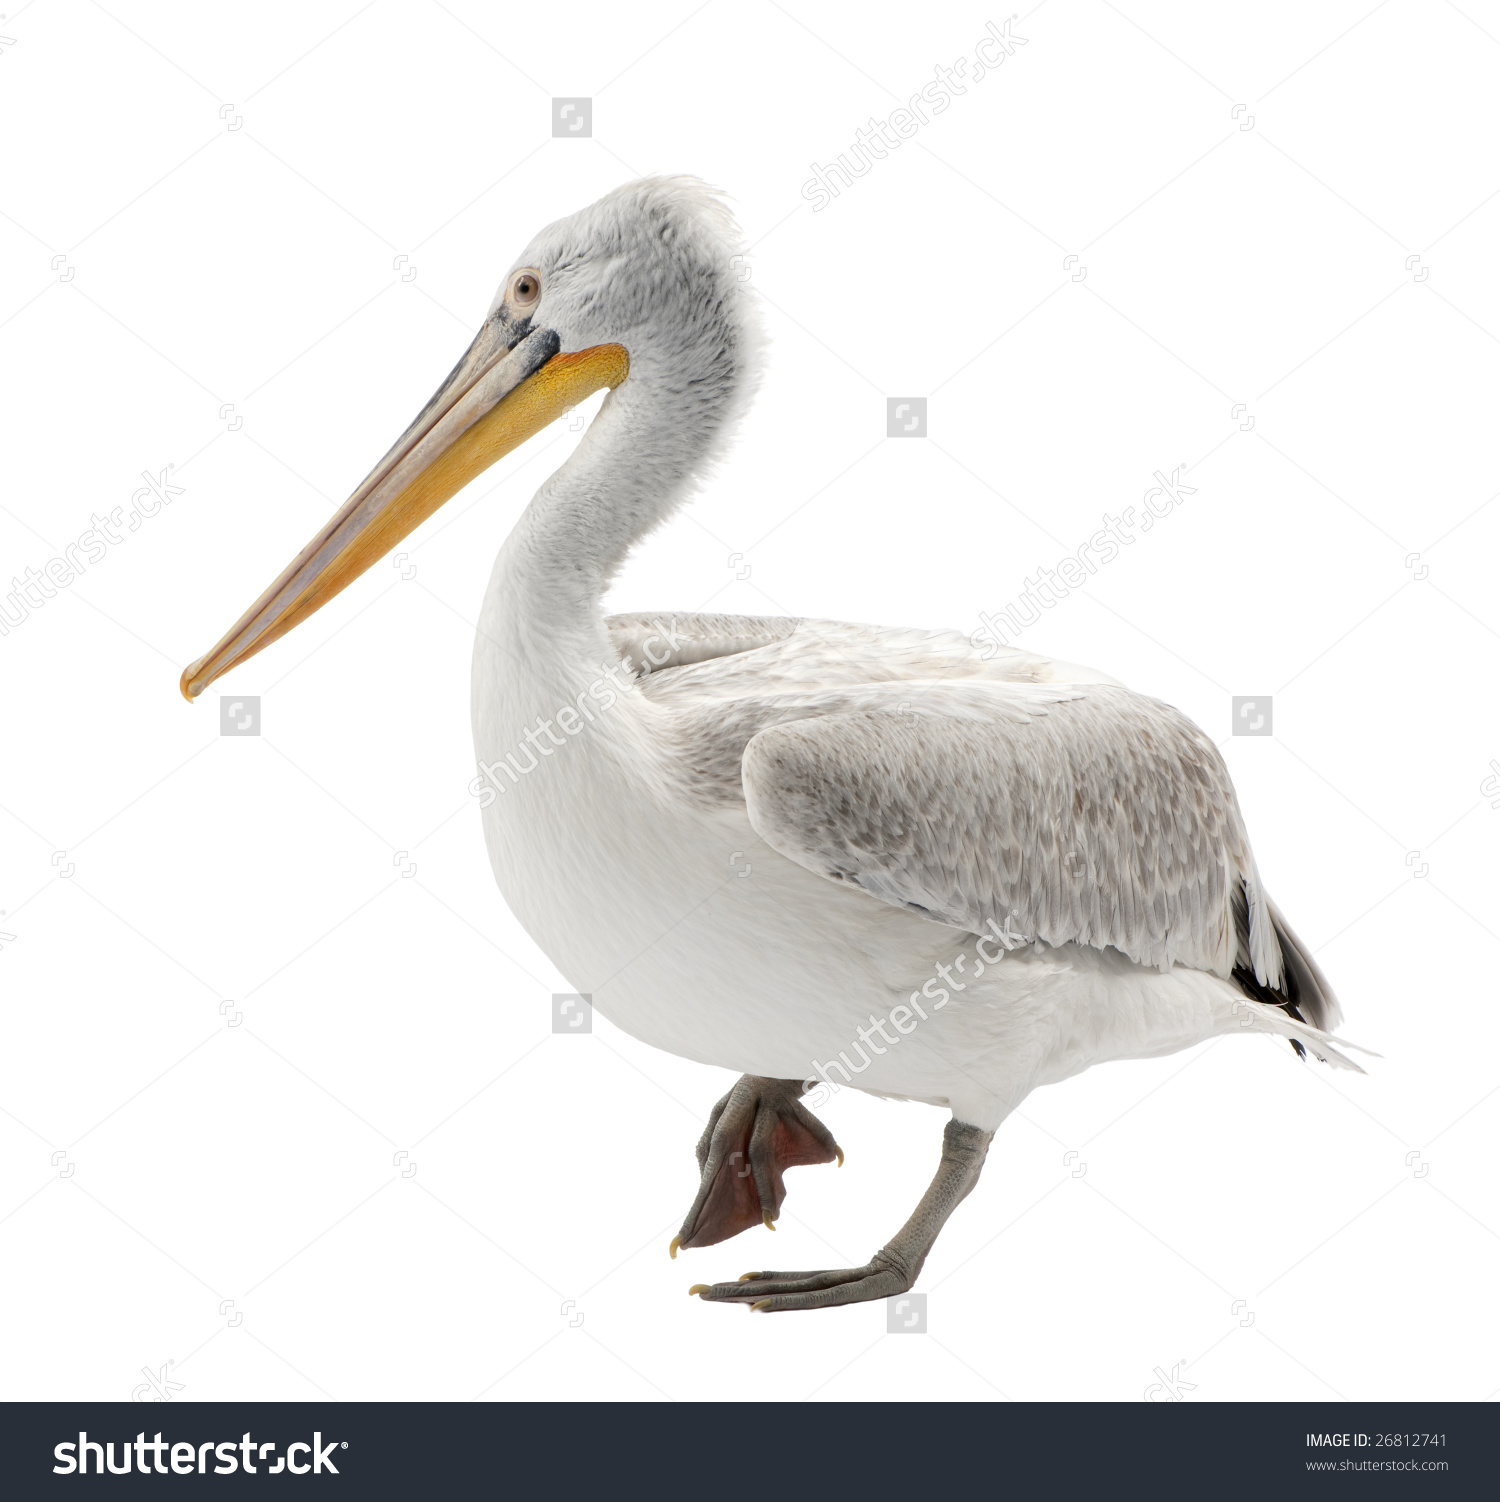 Dalmatian Pelican.